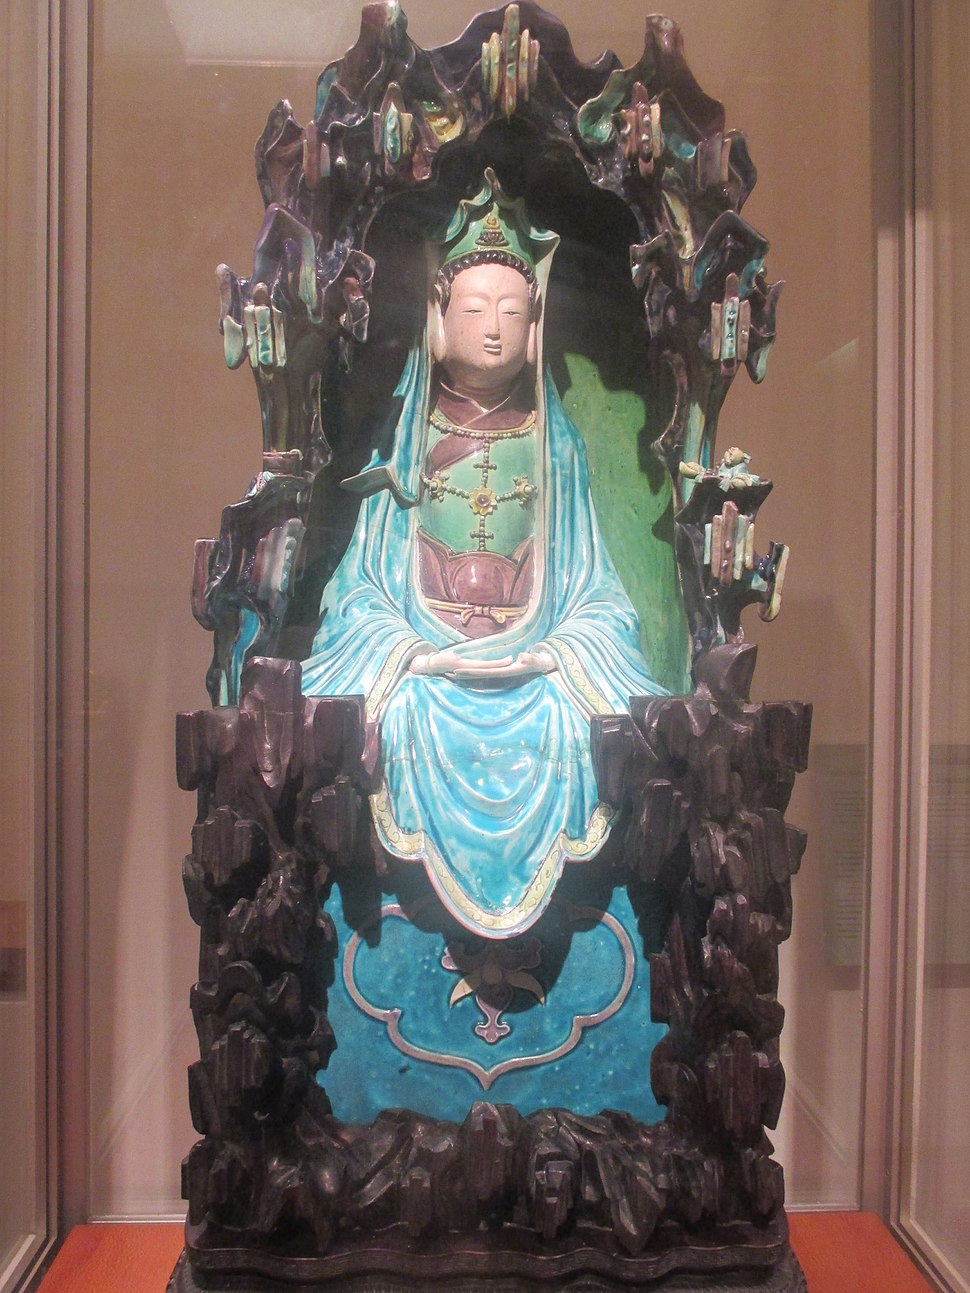 Bodhisattva Avalokitesvara Ming Guimet.jpeg